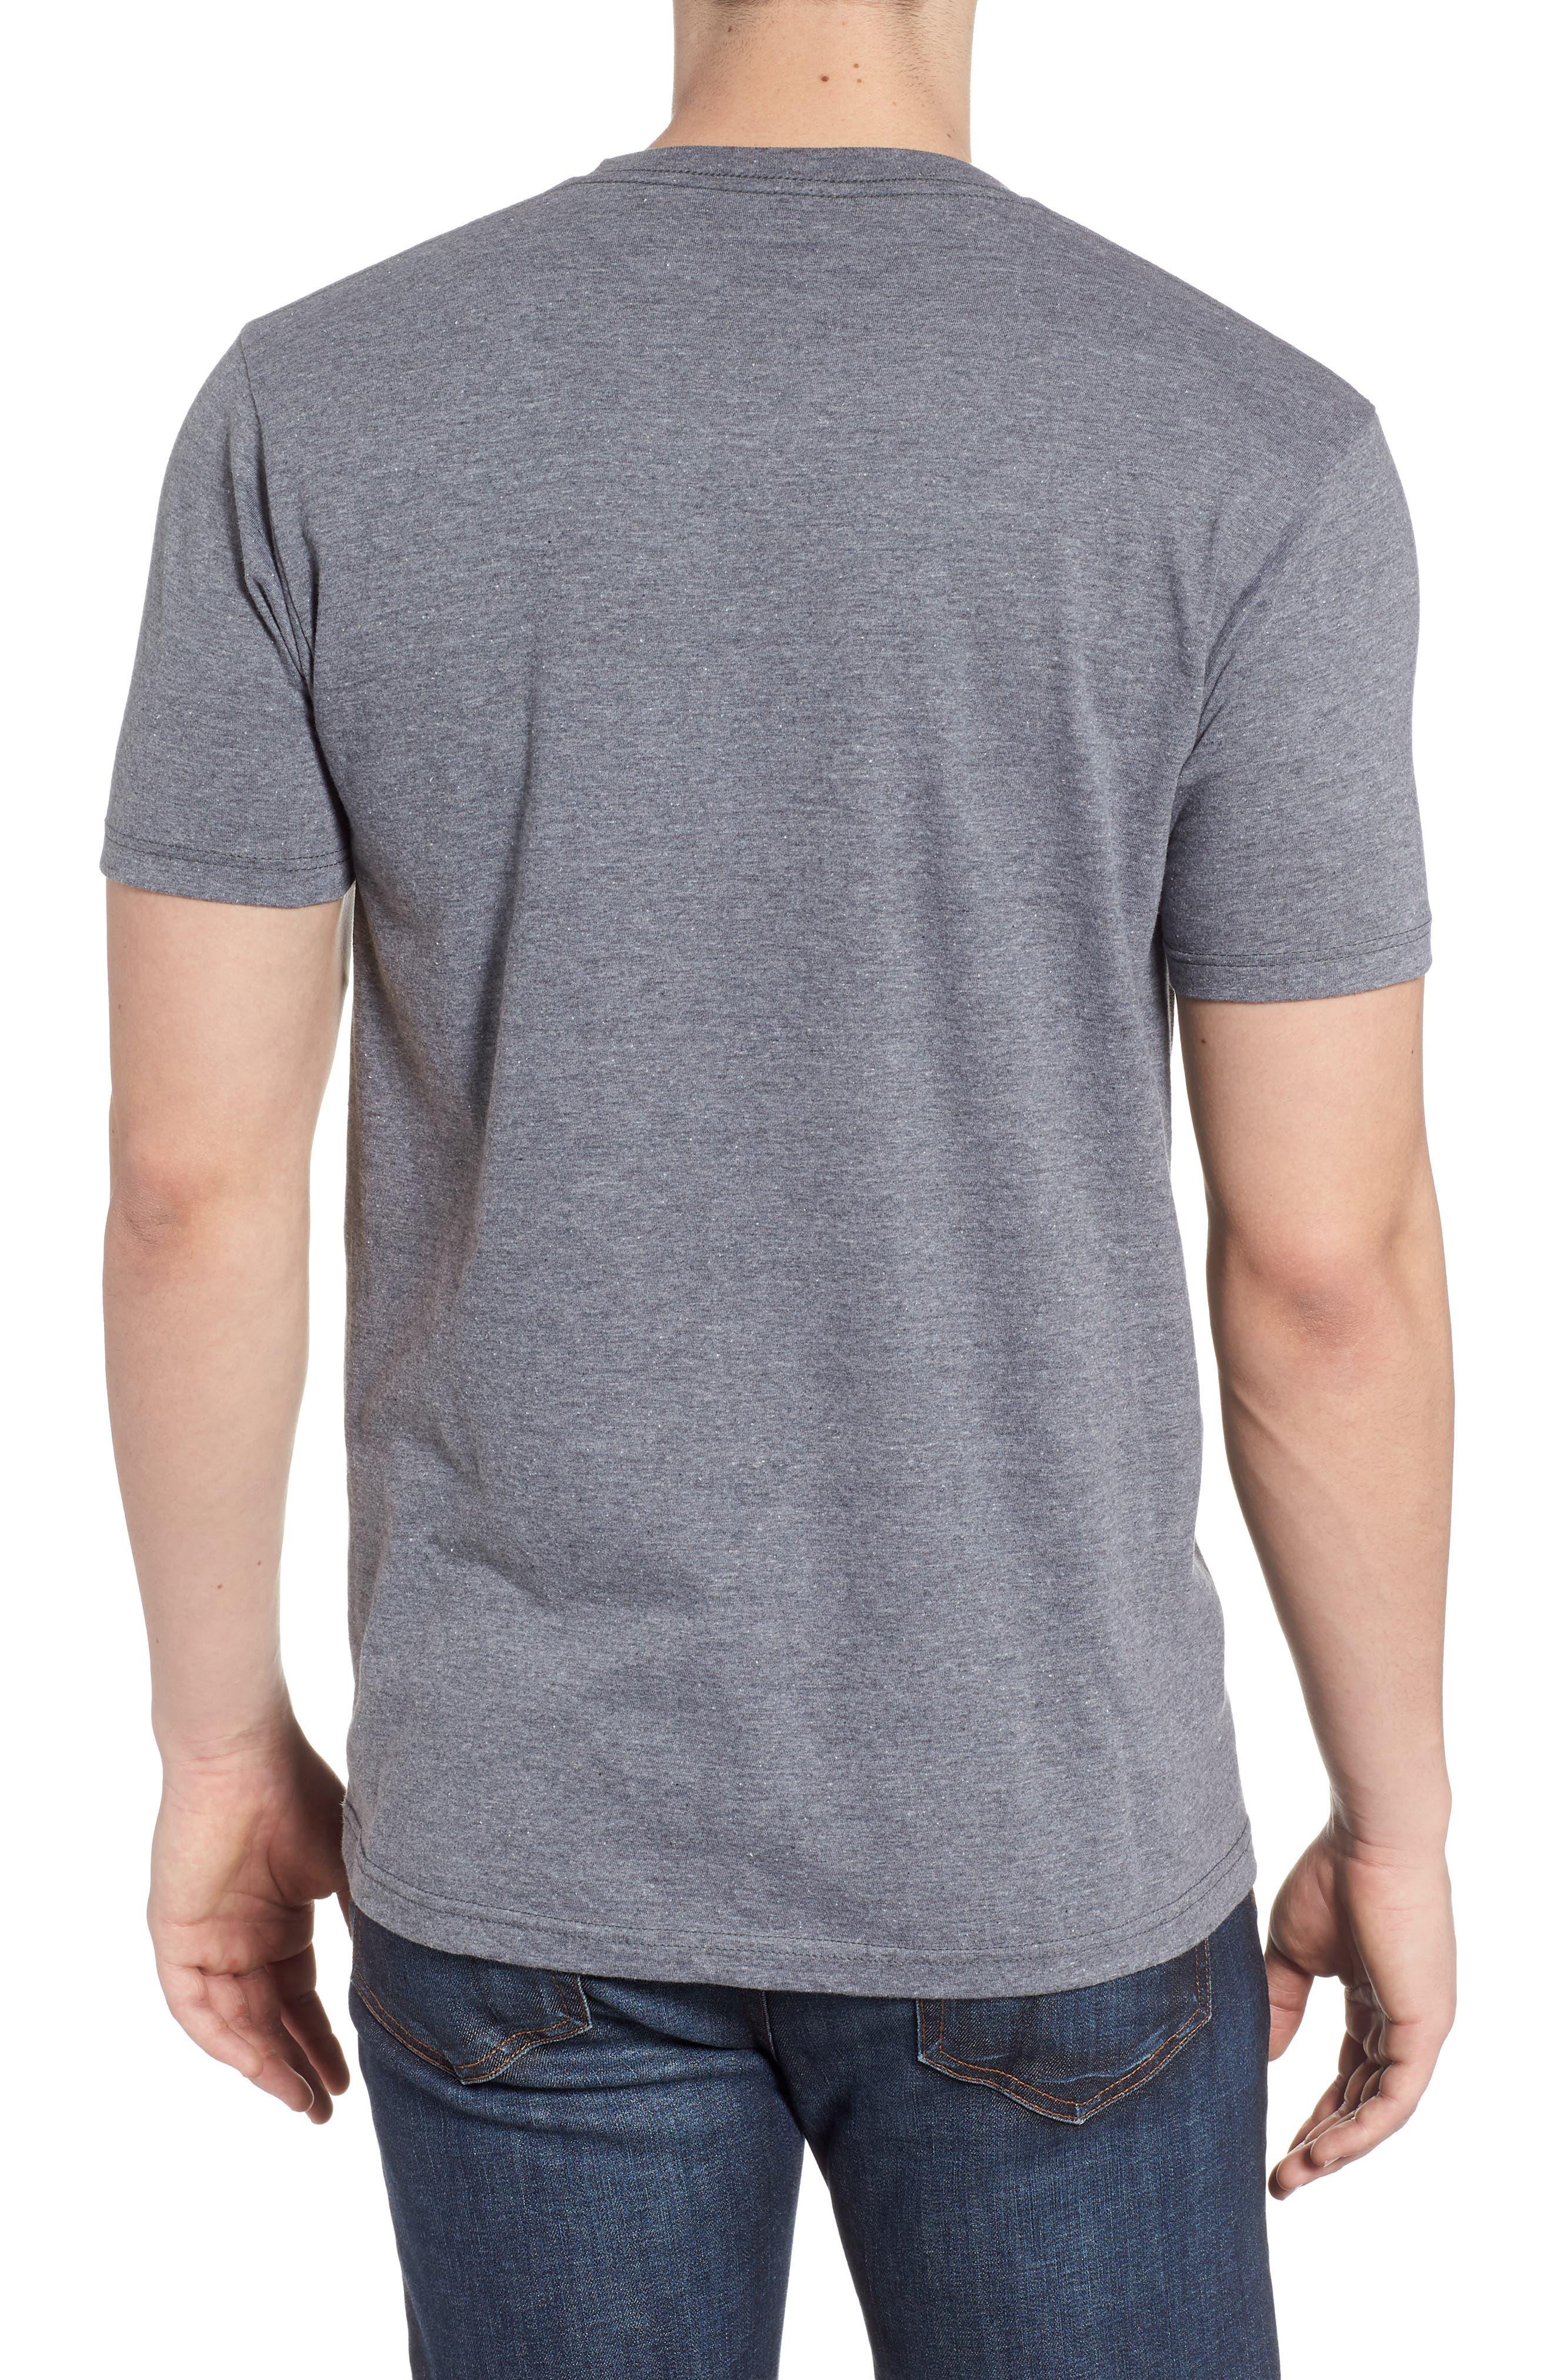 Cloud Break T-Shirt,                             Alternate thumbnail 2, color,                             080